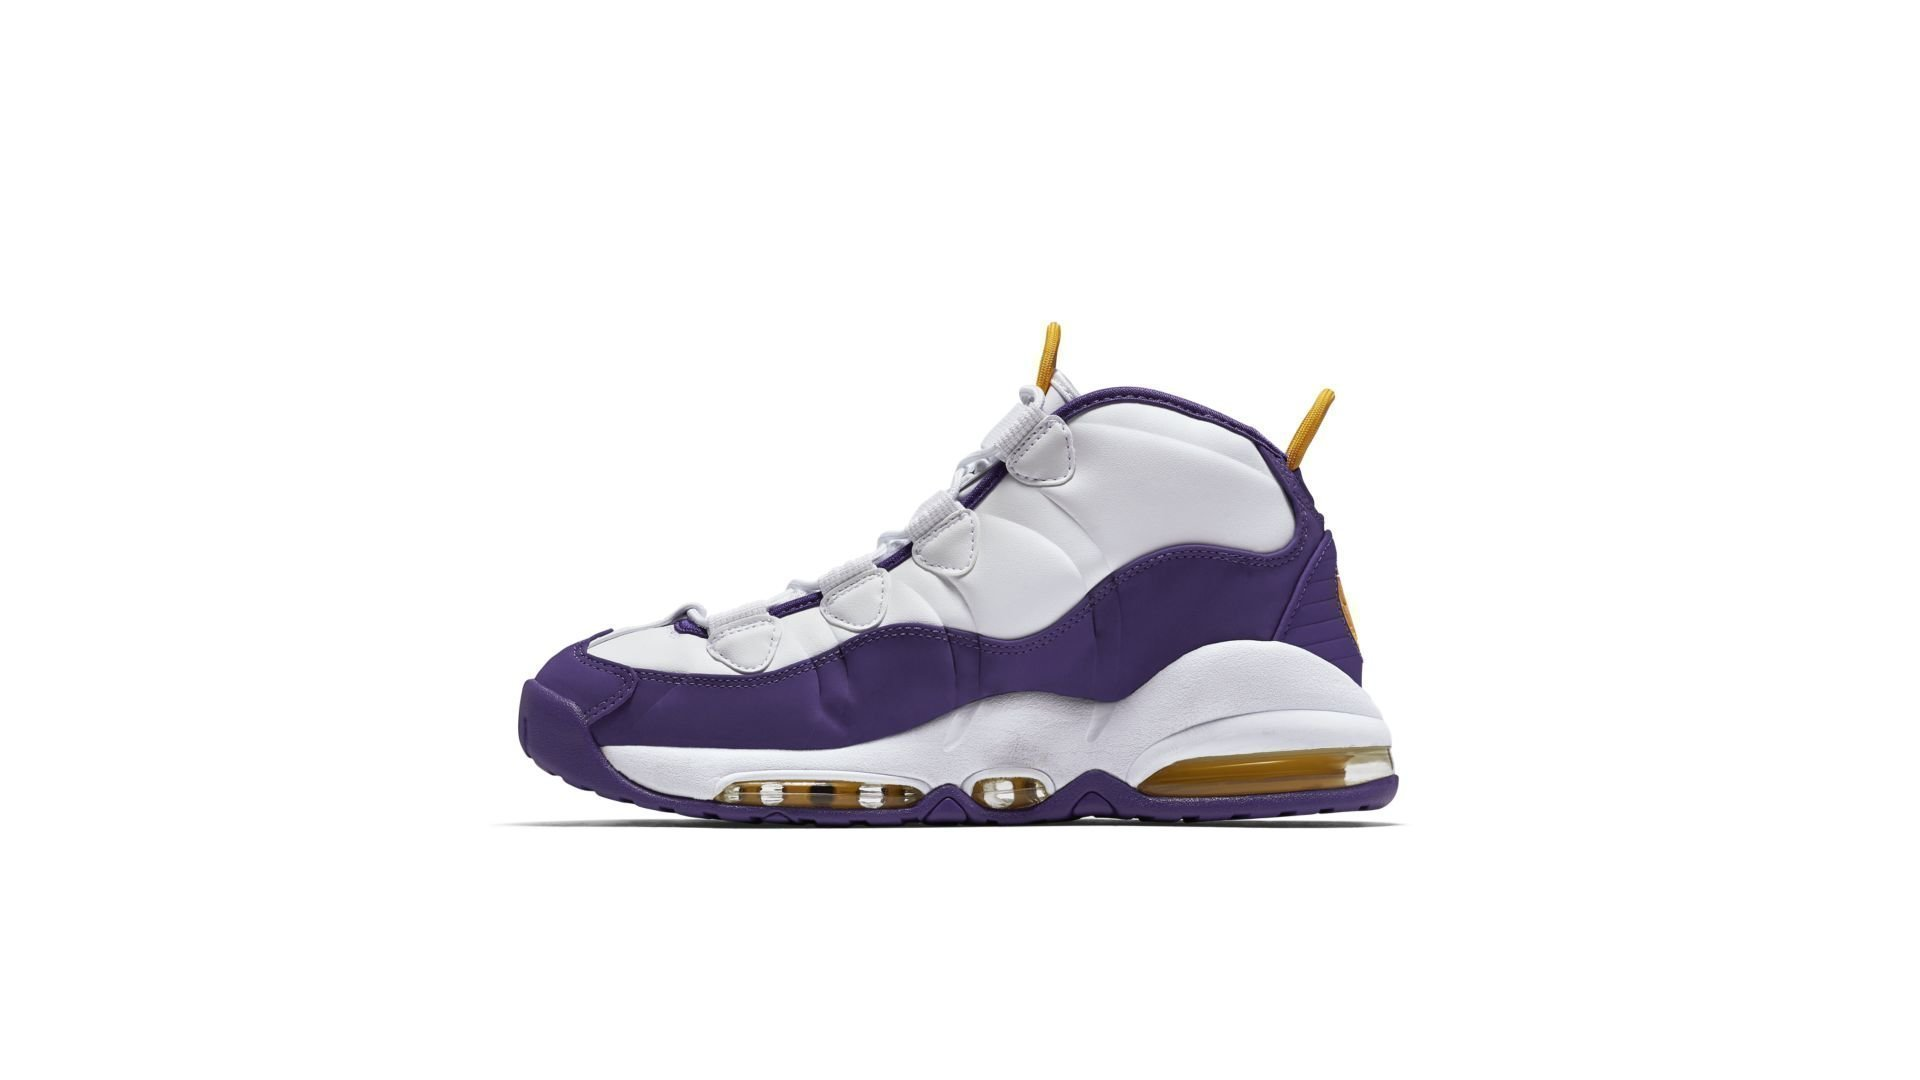 Nike Air Max Uptempo Lakers Derek Fisher (311090-103)